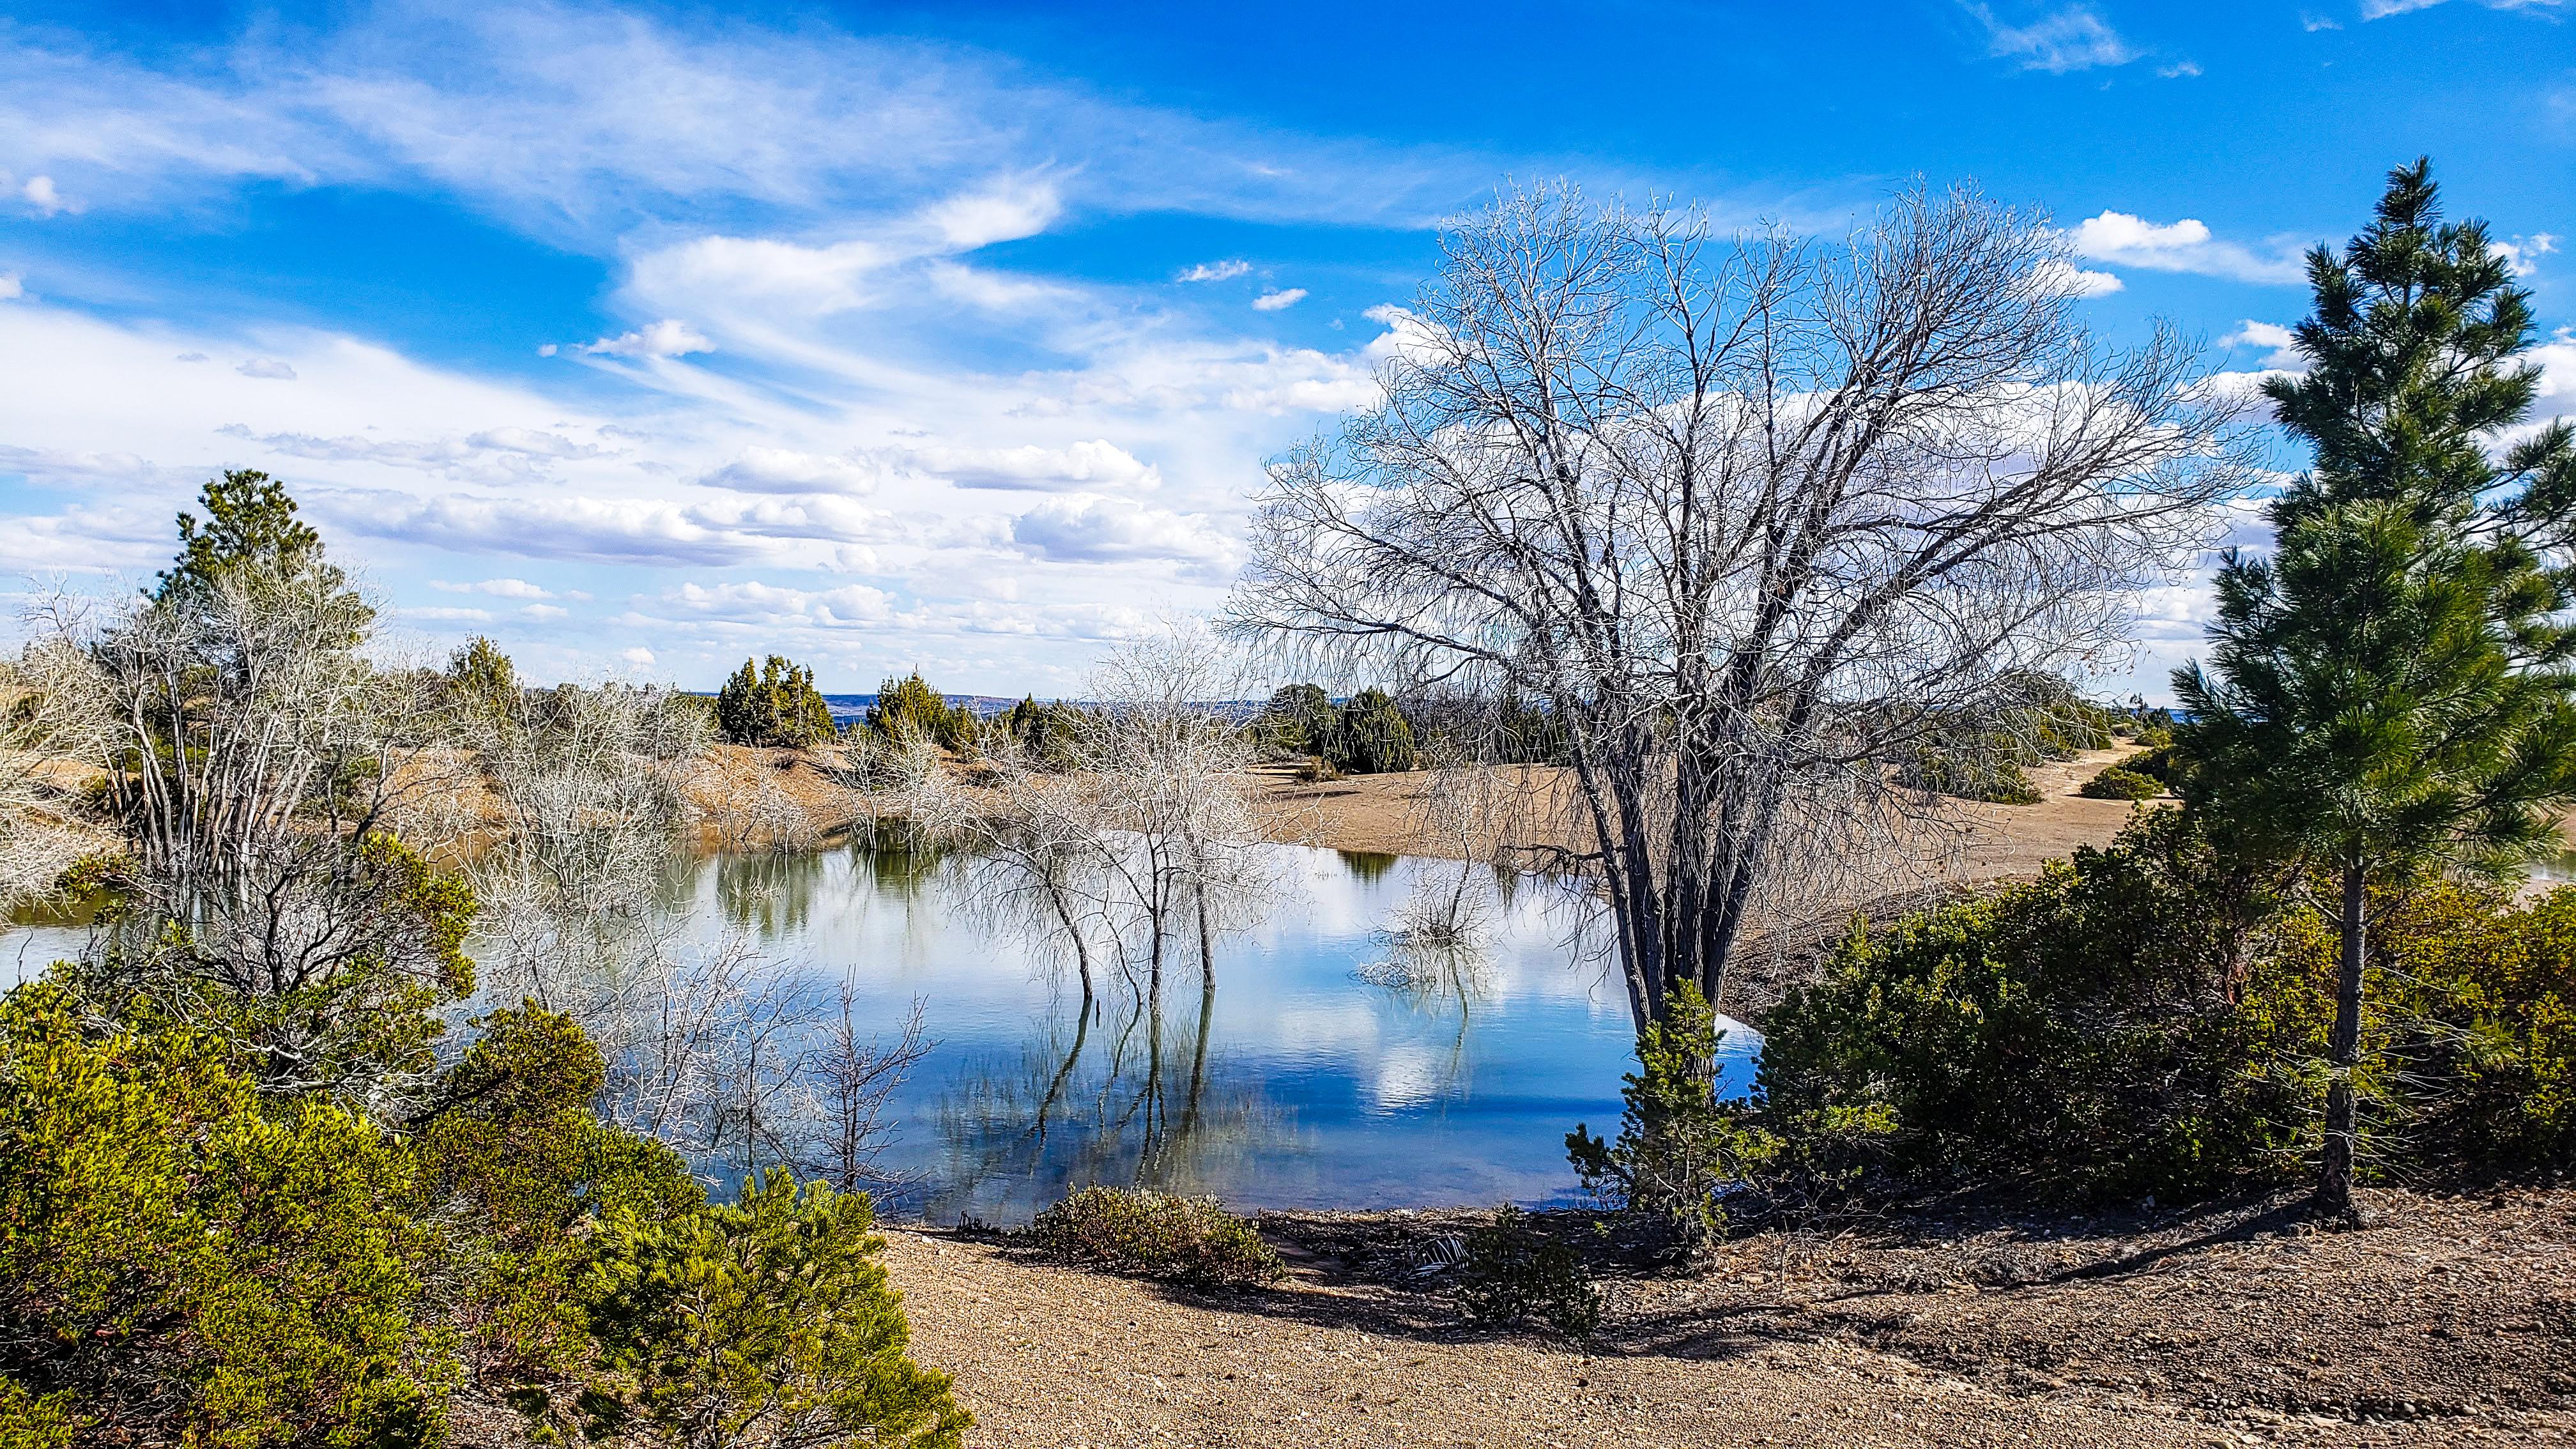 Beautiful BLM area near Zion National Park